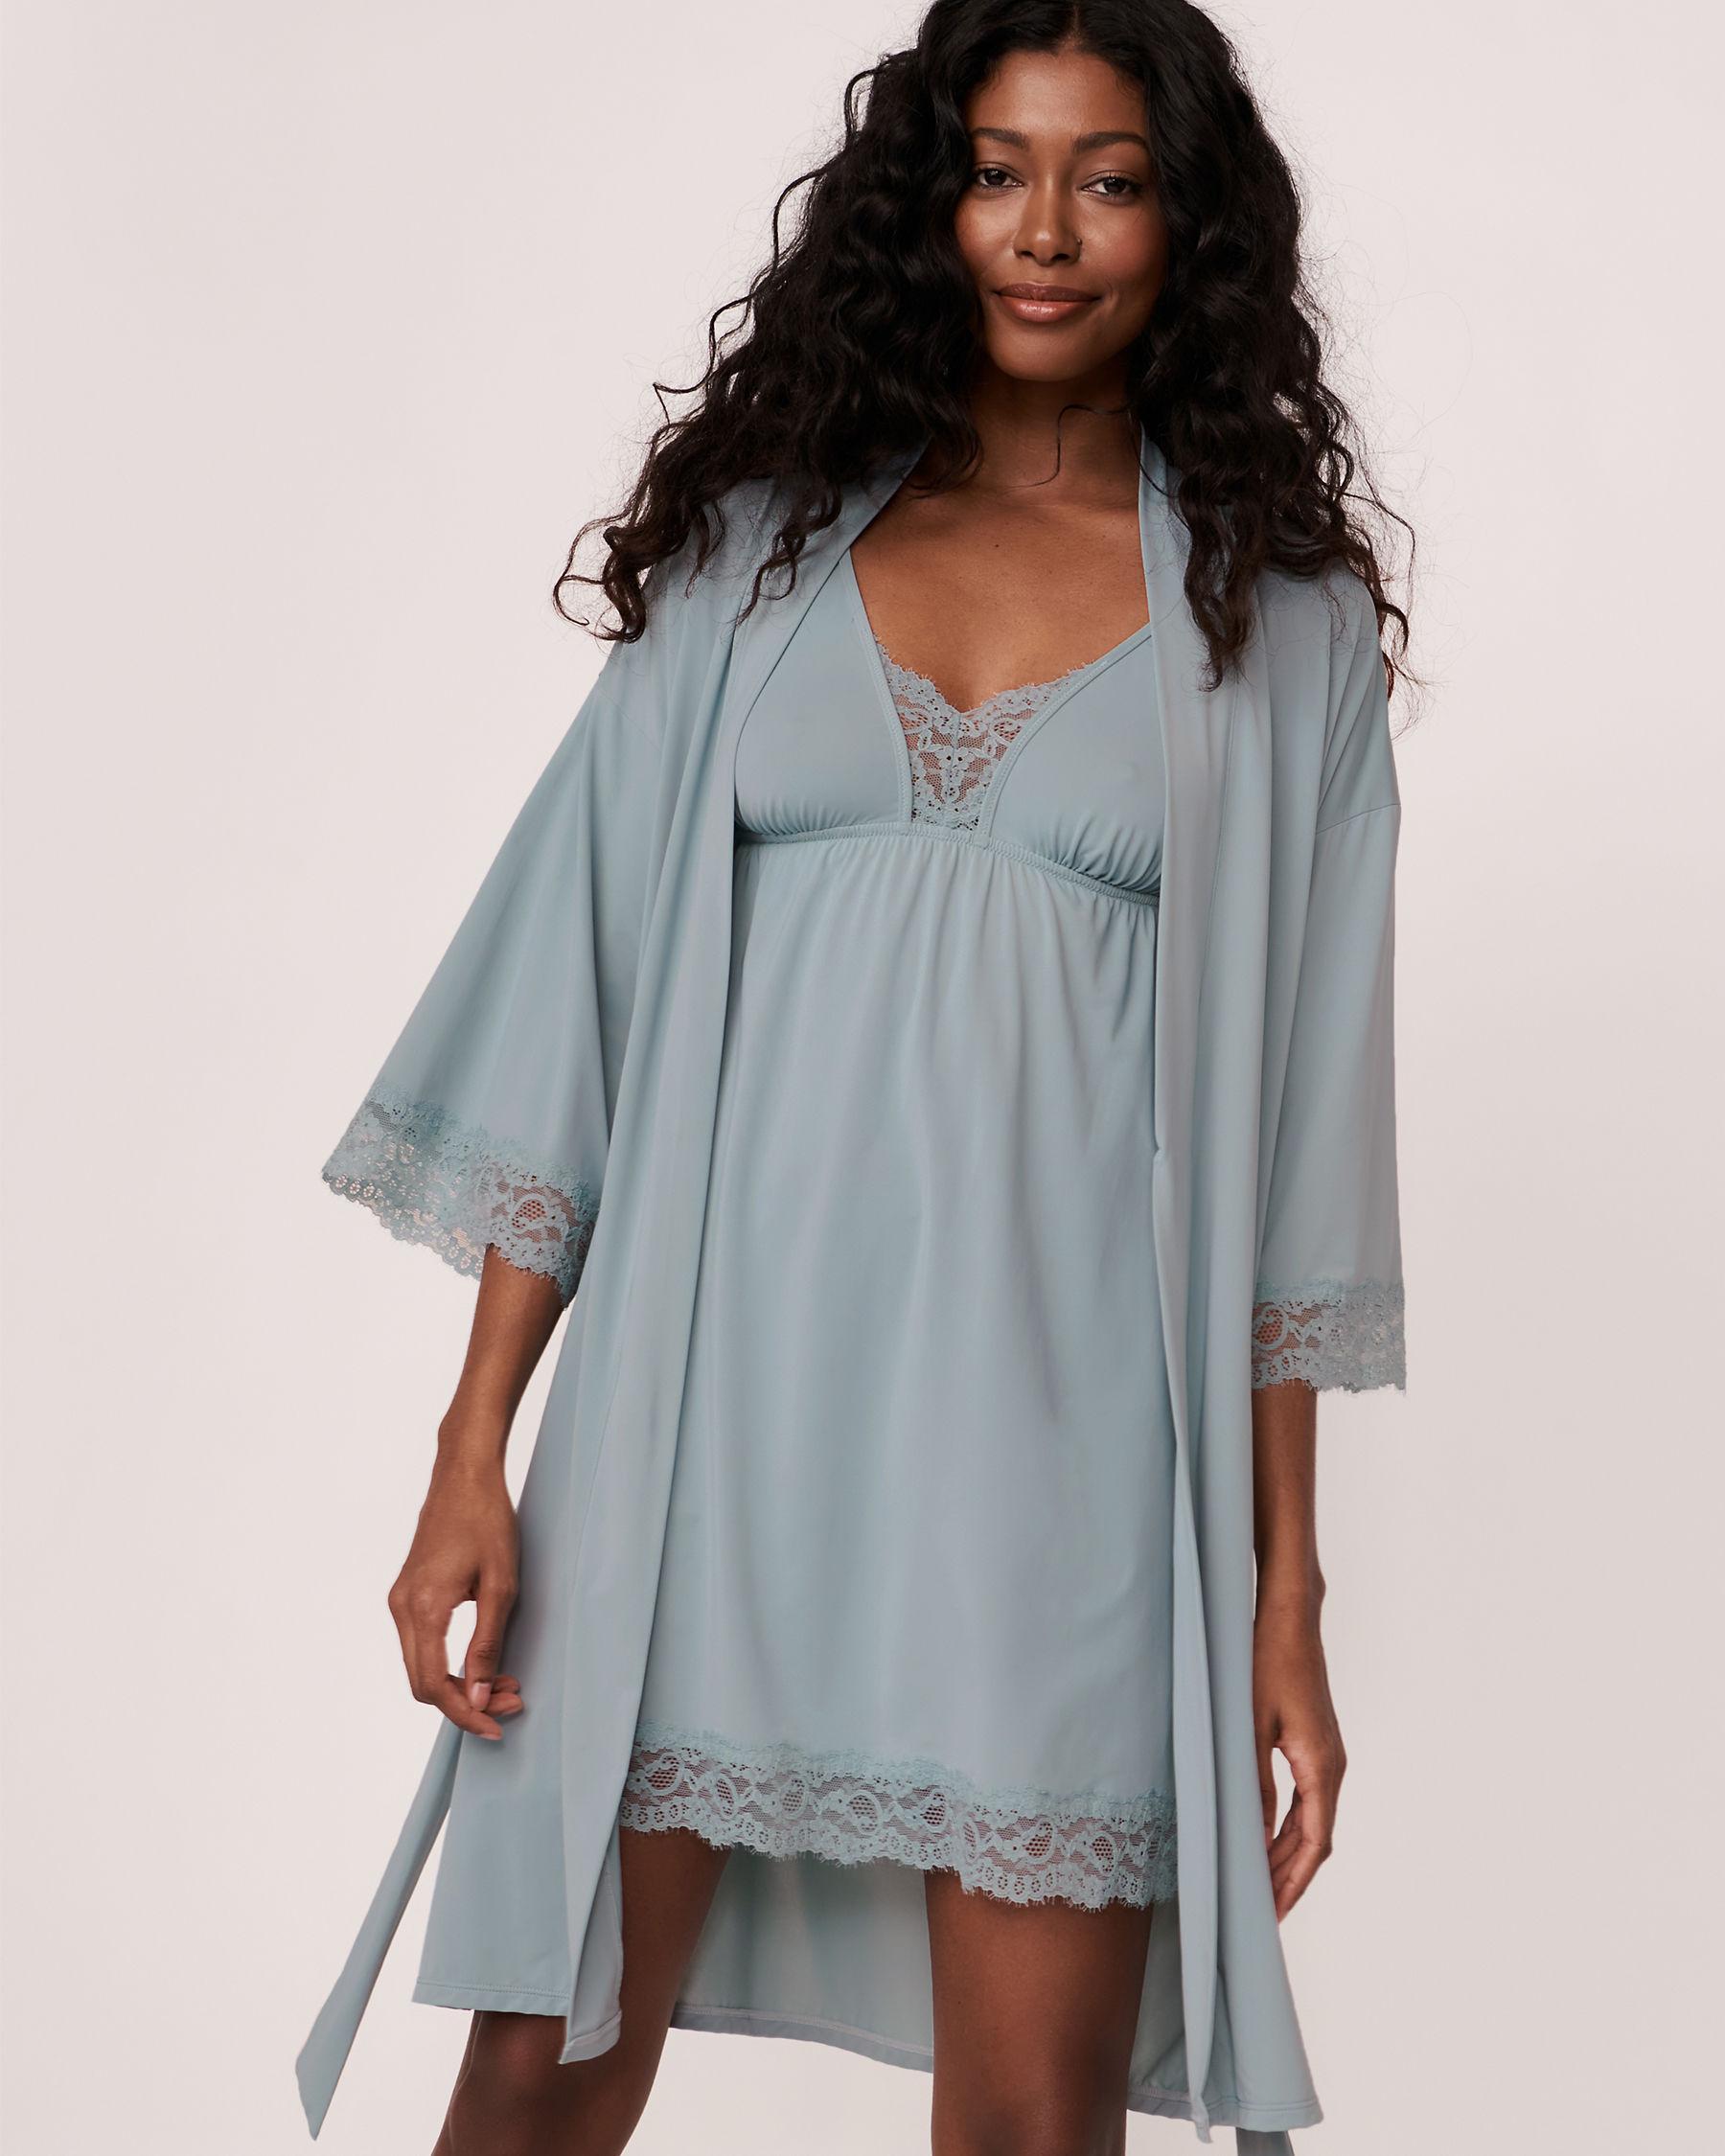 LA VIE EN ROSE Kimono garniture de dentelle Bleu gris 60600001 - Voir2